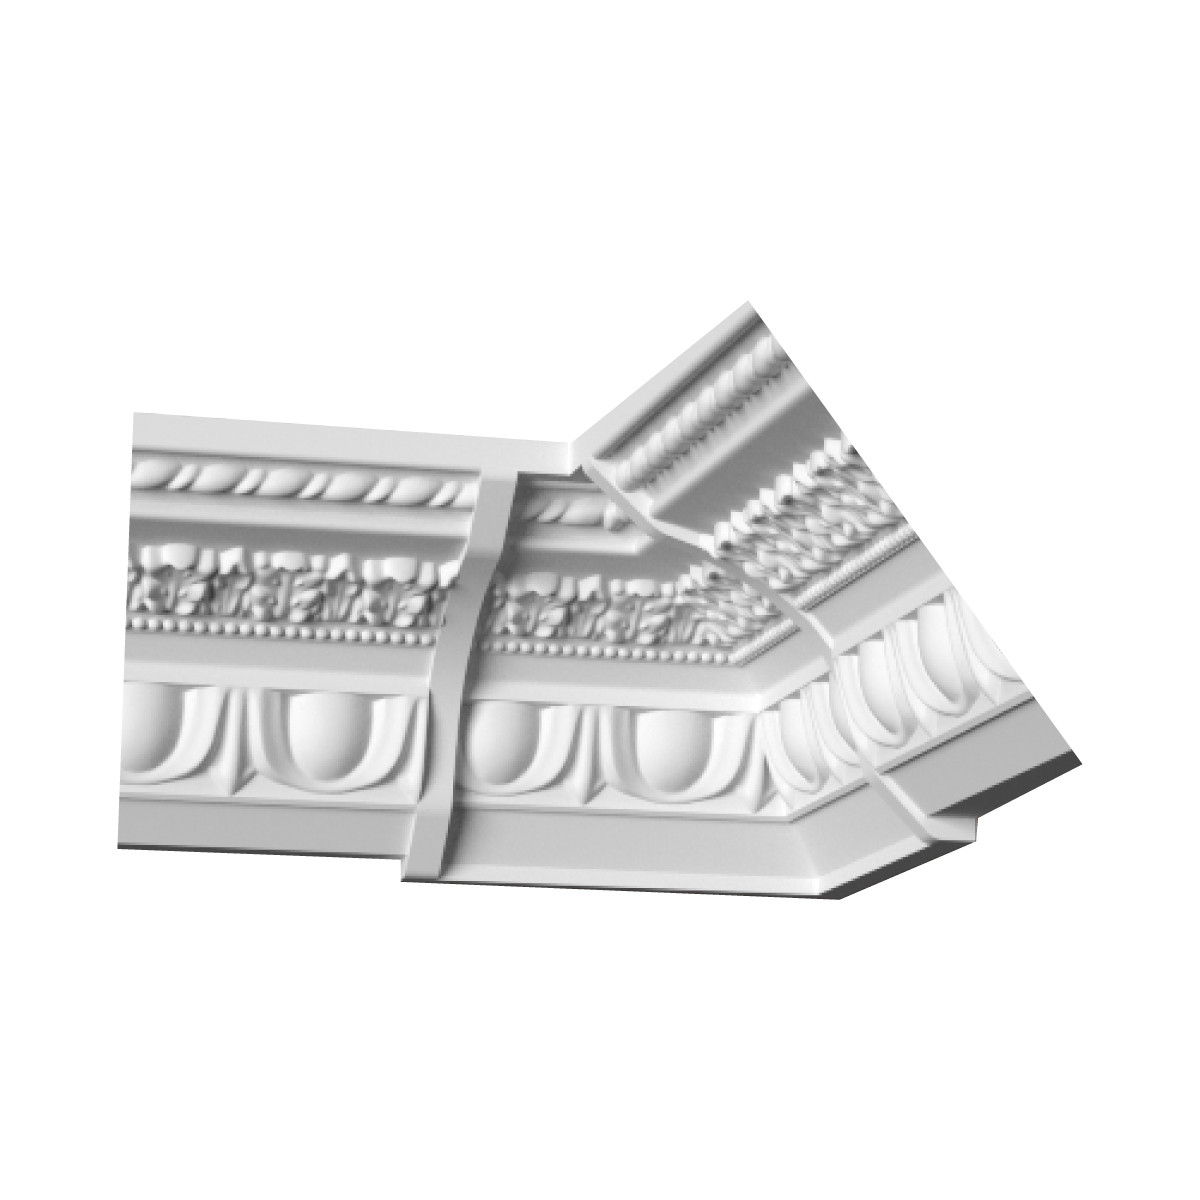 Гипсовая лепнина декоративный угол у-54 h92х110мм